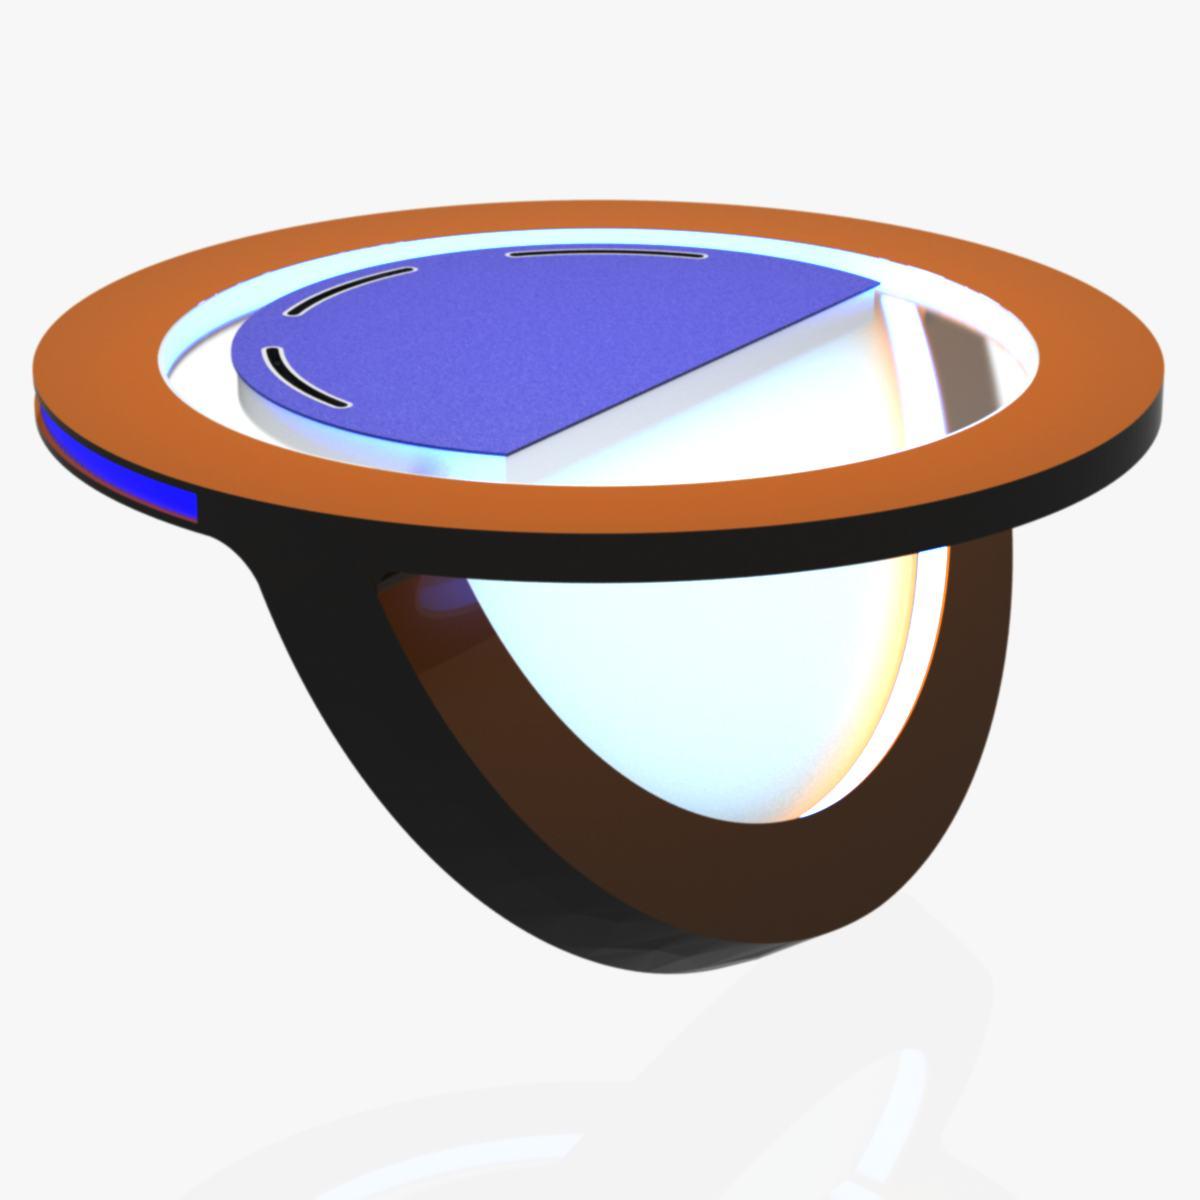 Virtual Tv Studio News Desk 10 3d Model Architecture 3d Models  # Meuble Tv Nesx